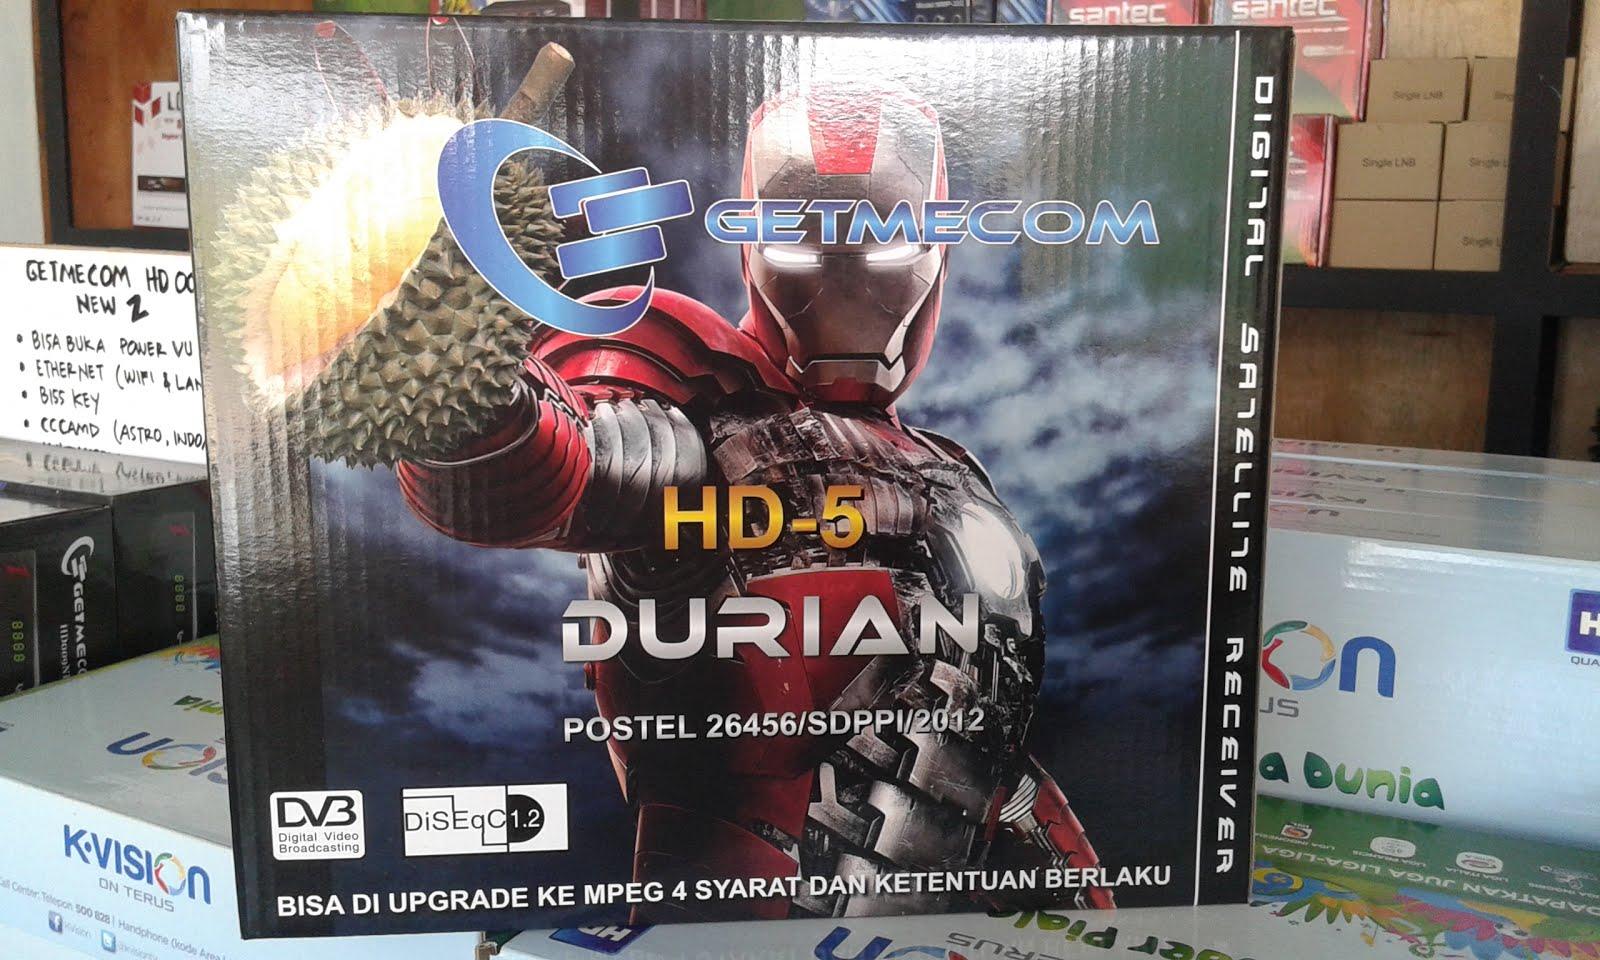 GETMECOM DURIAN MPEG2